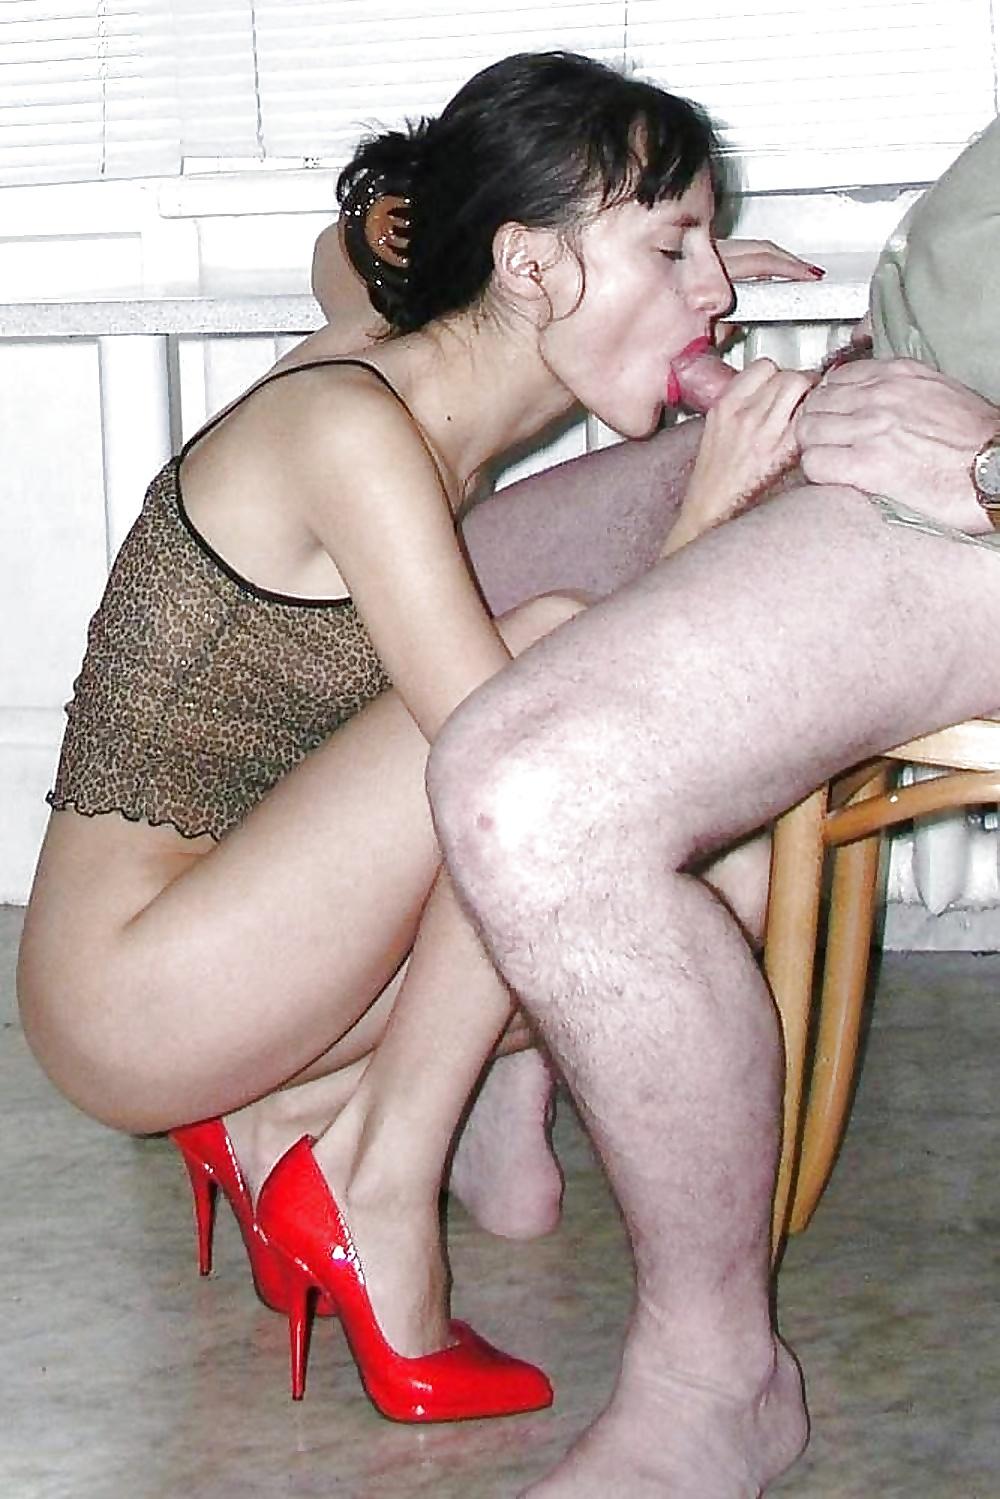 maman salopes du 35 à baiser